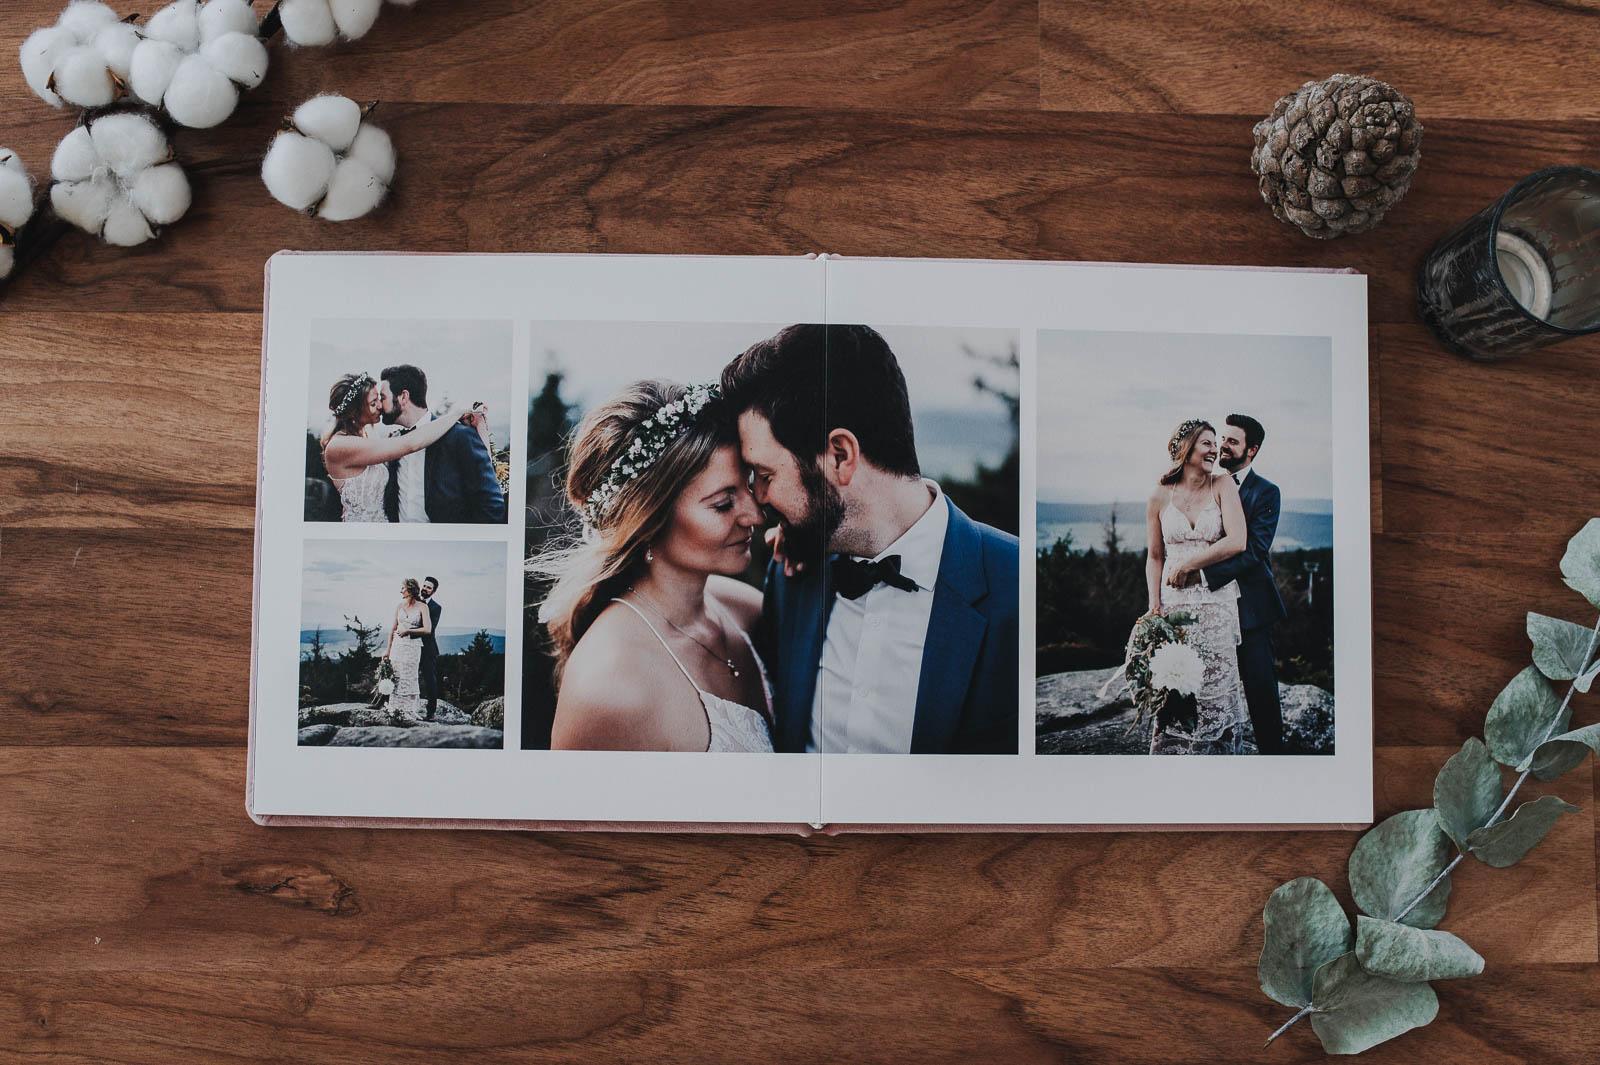 Hochzeitsalbum lovelace photography